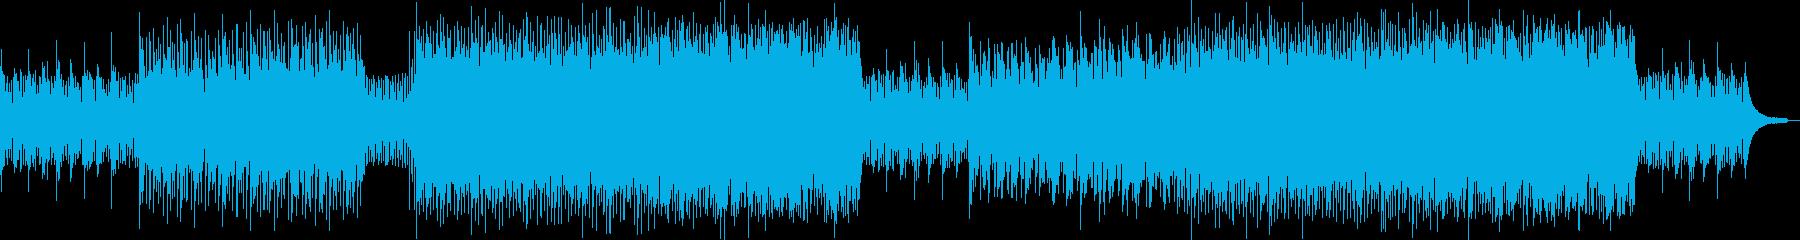 volitionの再生済みの波形